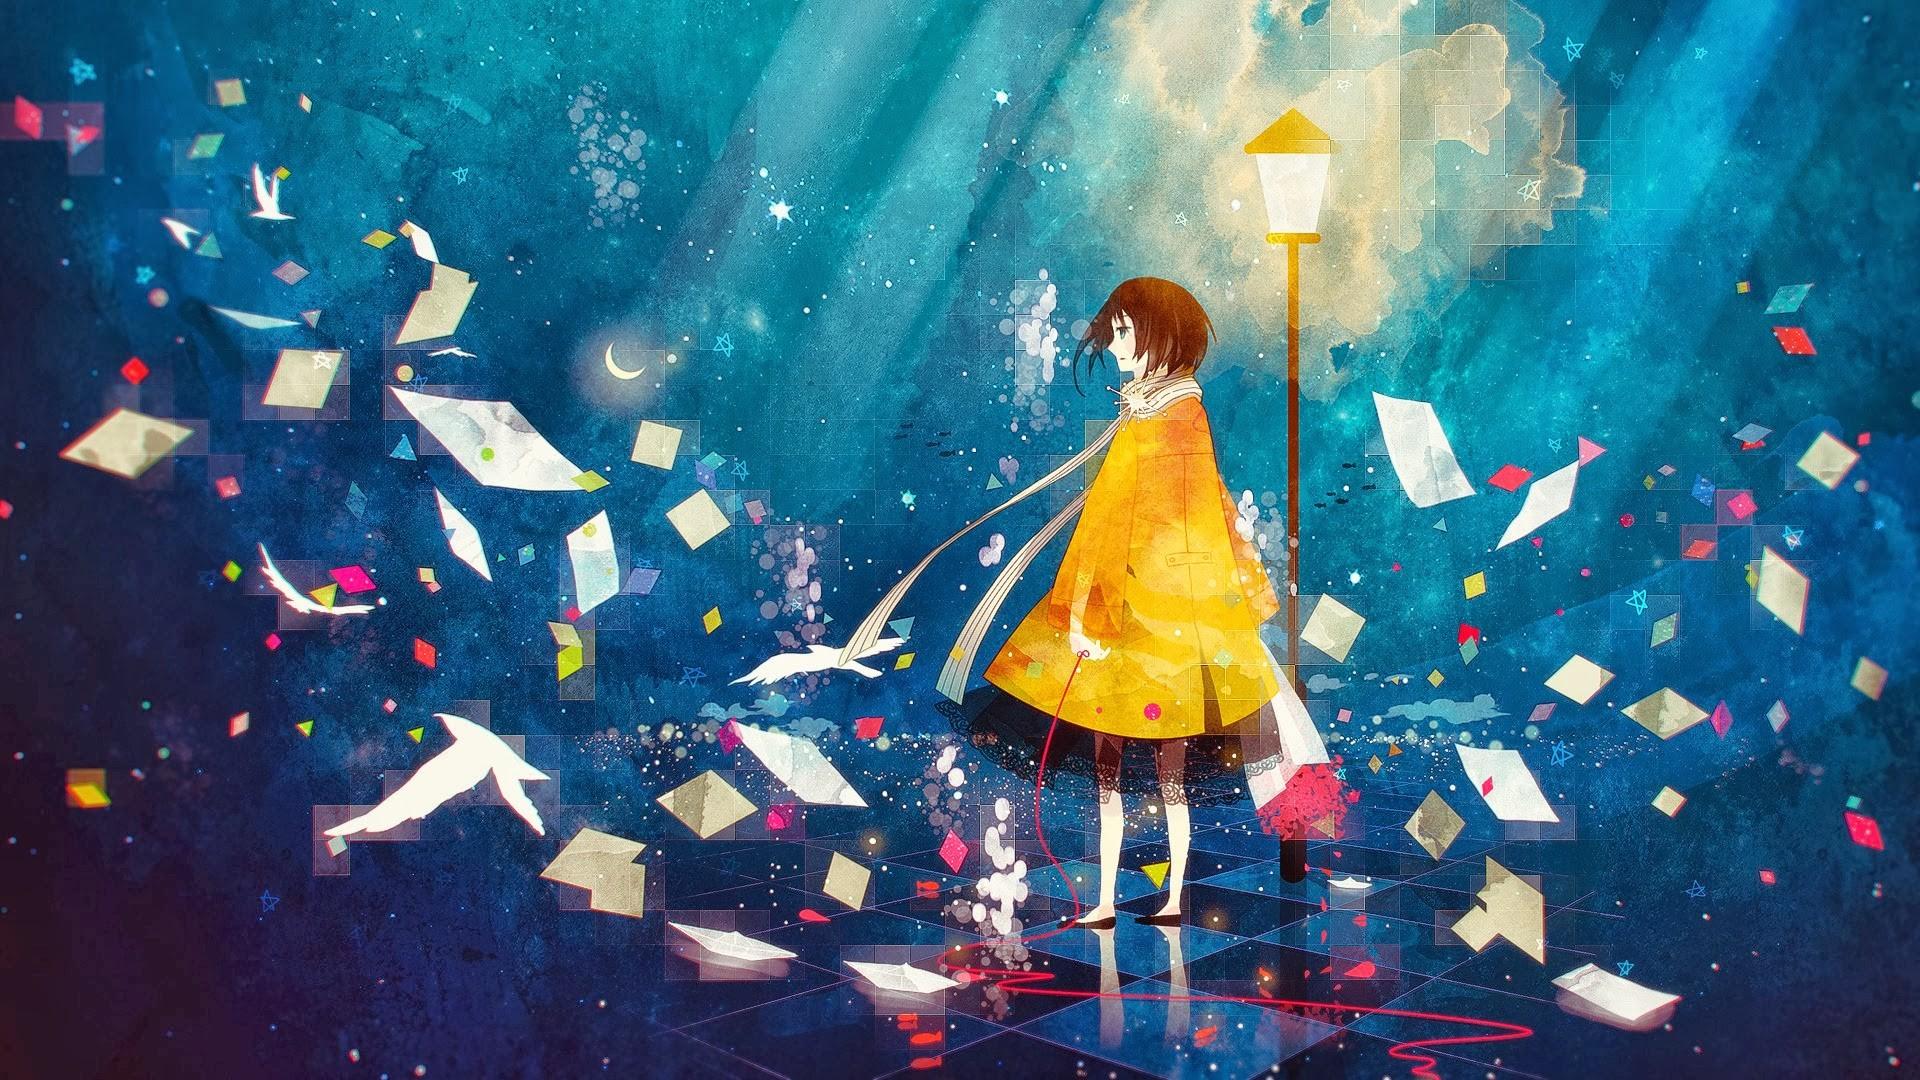 Anime Girls Lantern Anime Wallpaper Resolution 1920x1080 Id 630268 Wallha Com